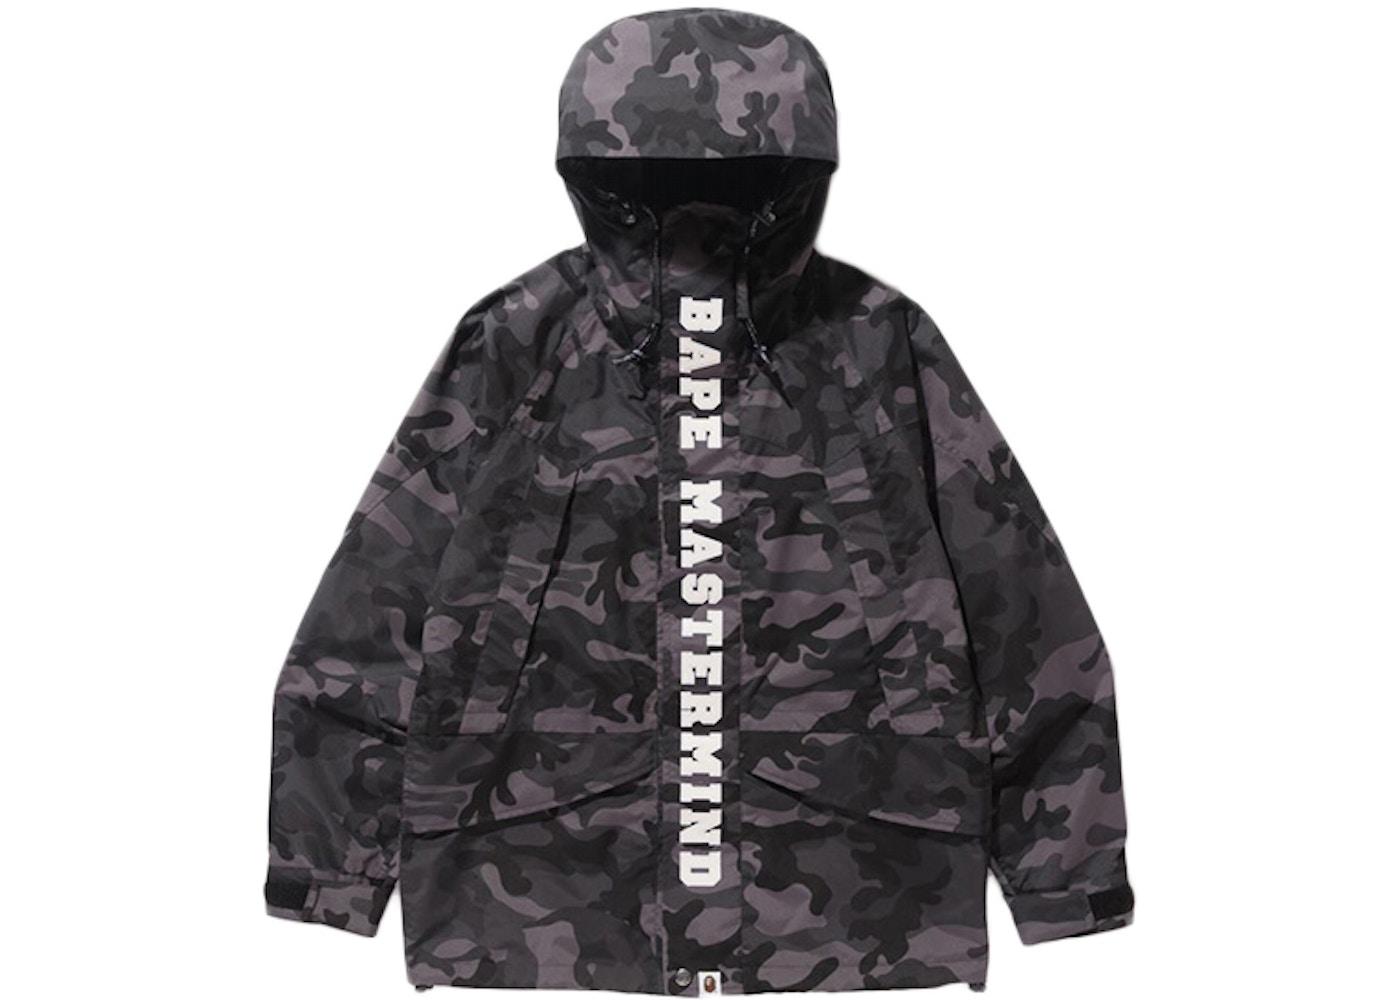 official photos 9b7b0 0a3b2 BAPE X Mastermind Japan Snowboard Jacket Black - FW16